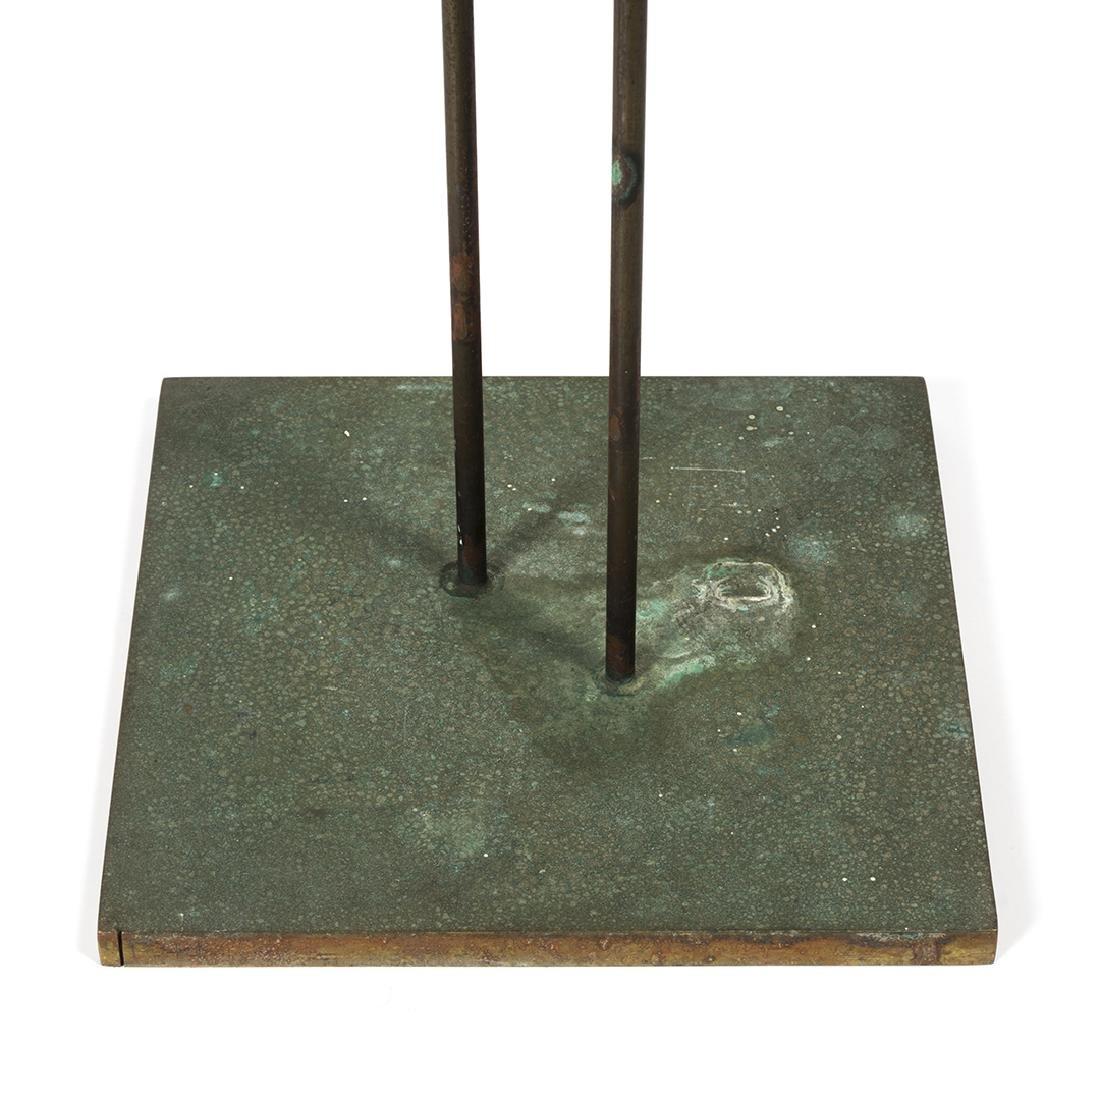 Val Bertoia Sonambient Sculpture - 3